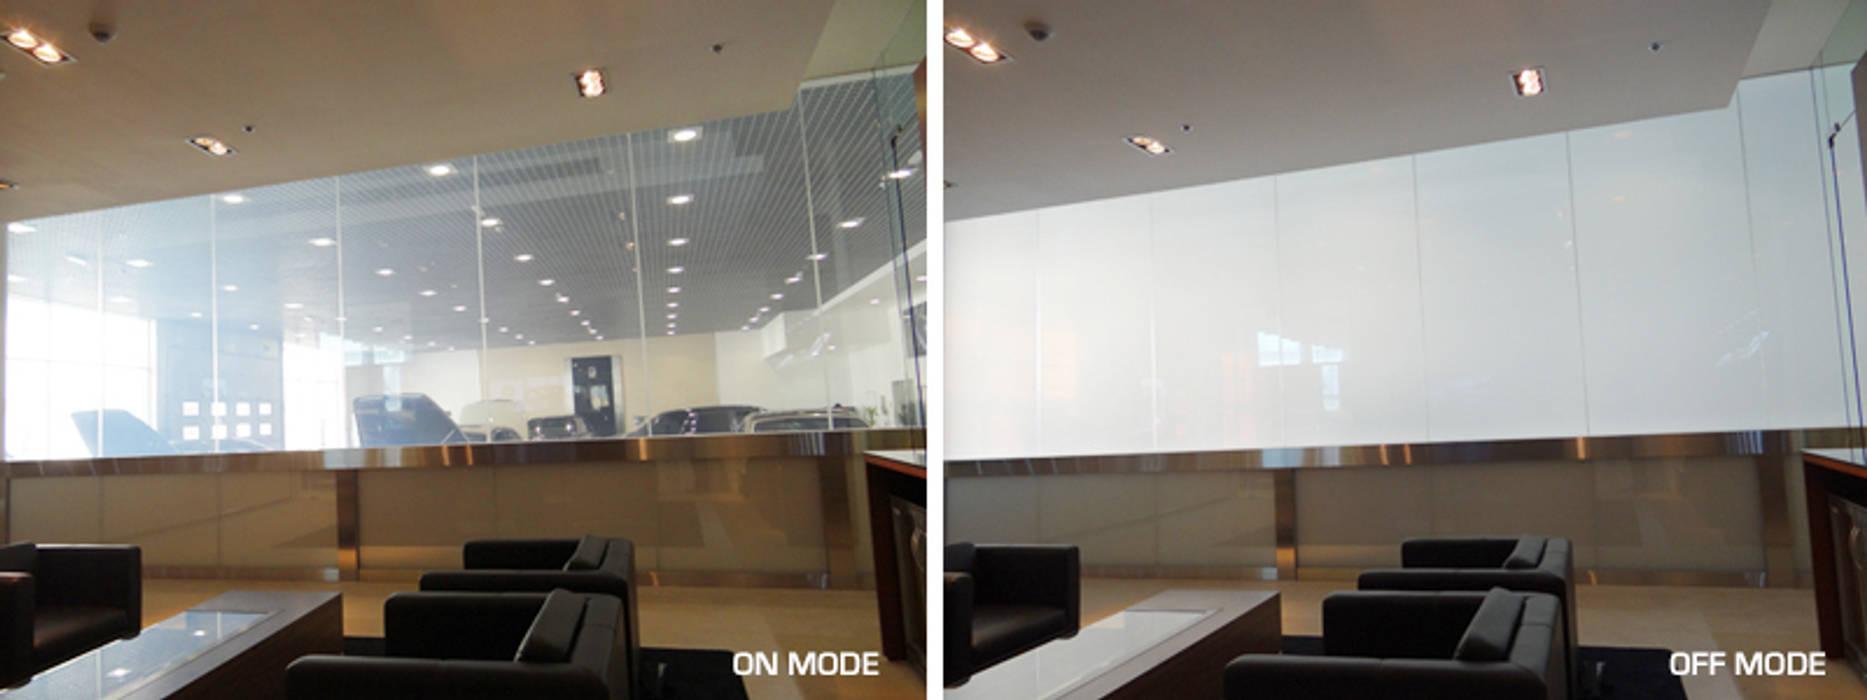 Vidrios de privacidad Concessionarie d'auto moderne